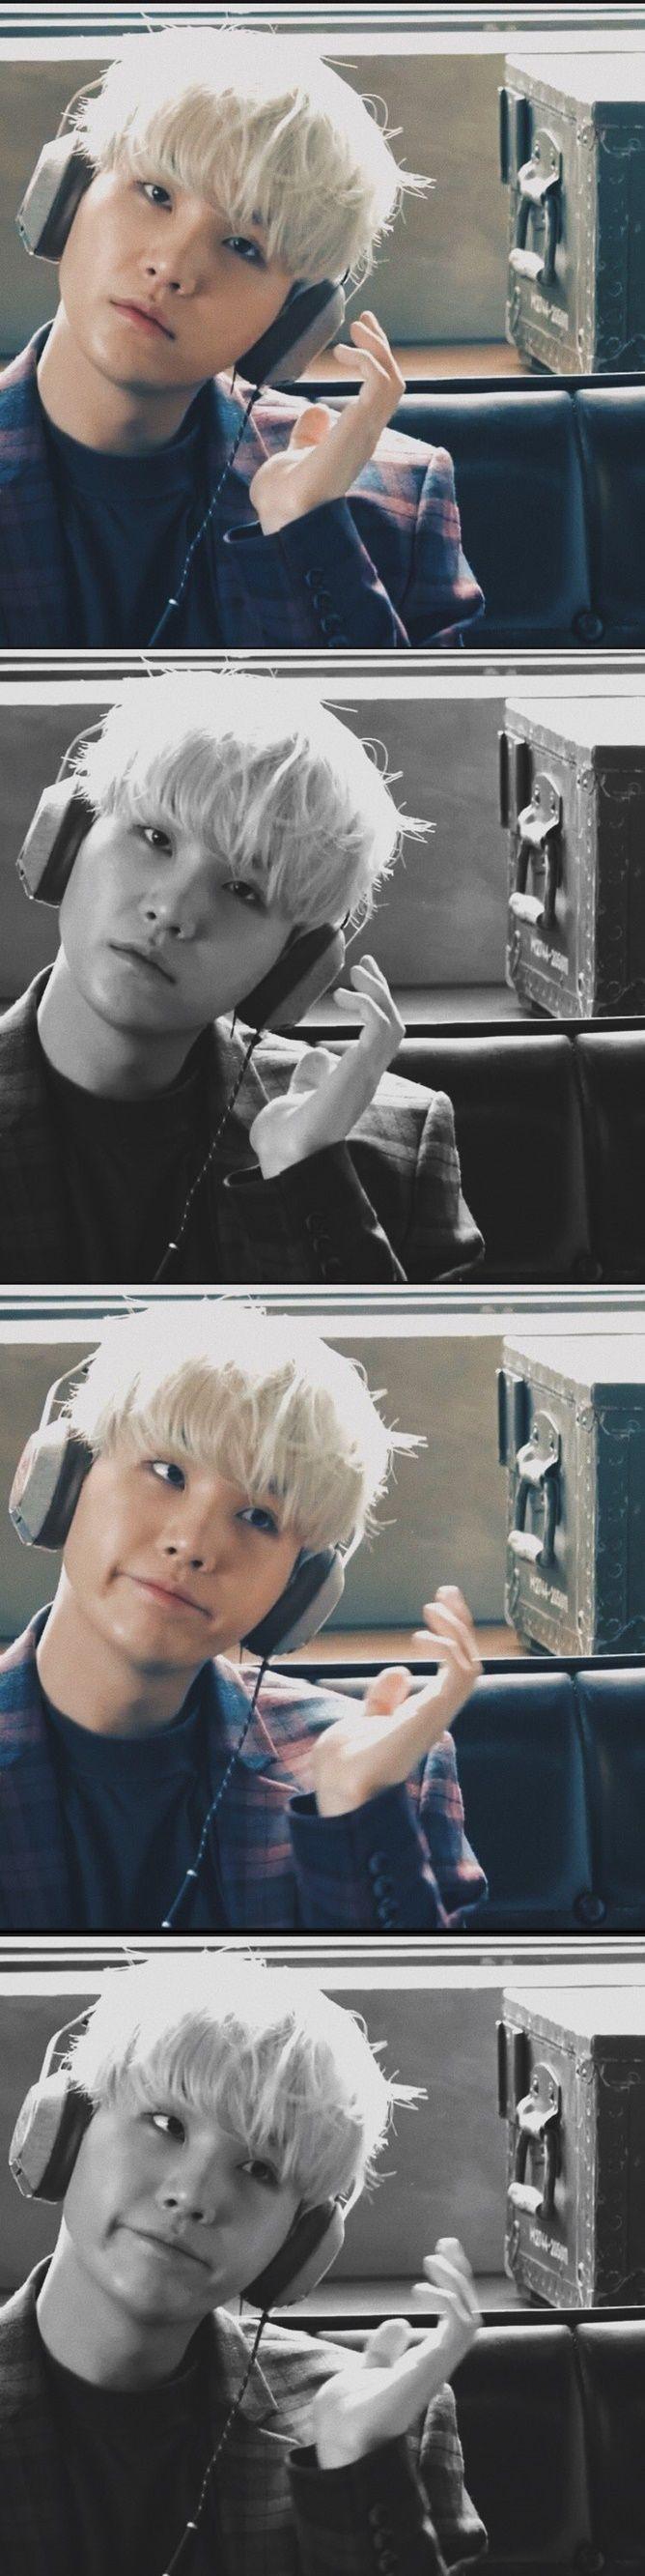 171223 MEDIHEAL x BTS! Medihealing story making version 1~ ♡ #BTS #방탄소년단 #Suga